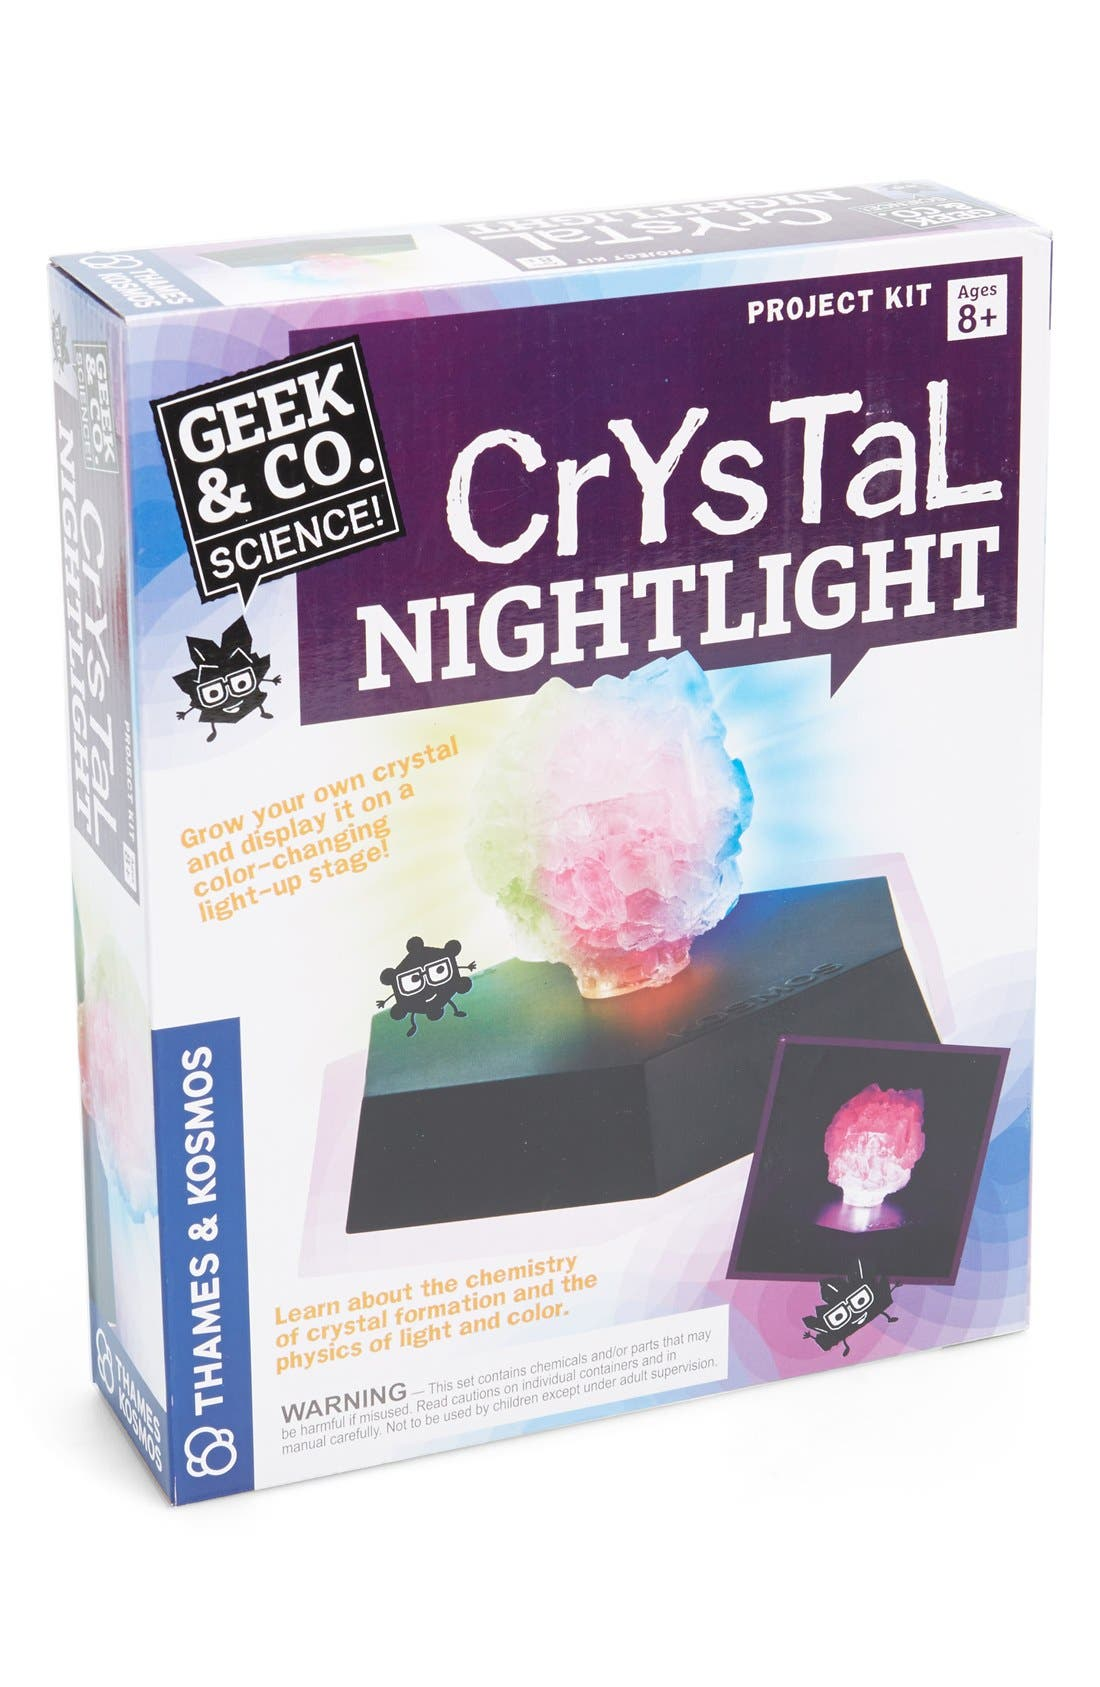 Thames & Kosmos Crystal Nightlight Kit